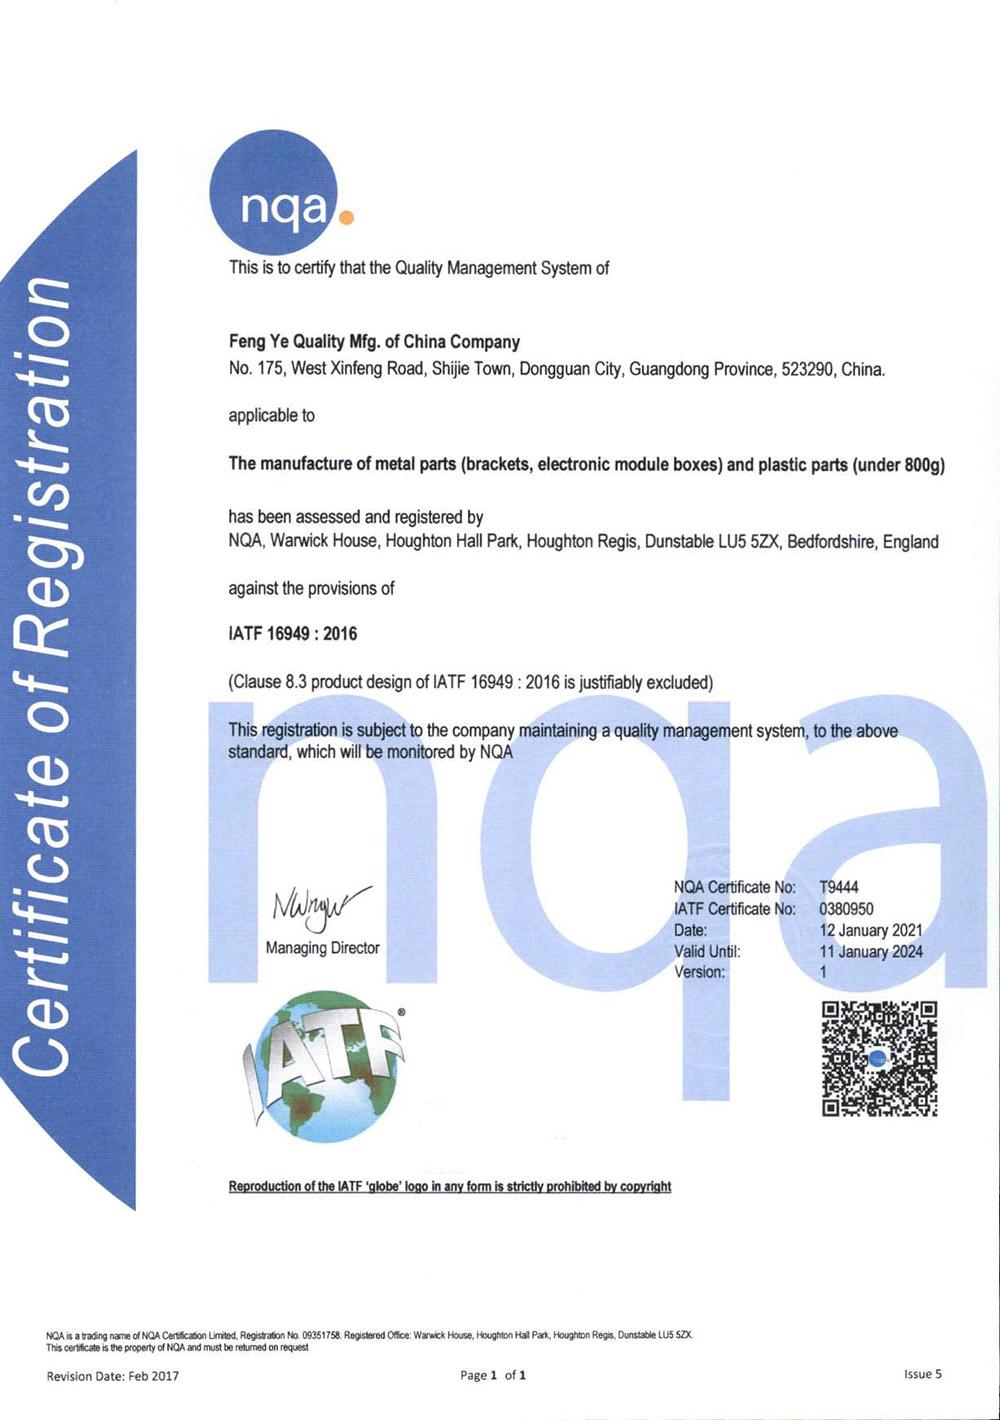 IATF2016-Quality-Management-System-Certificate.jpg